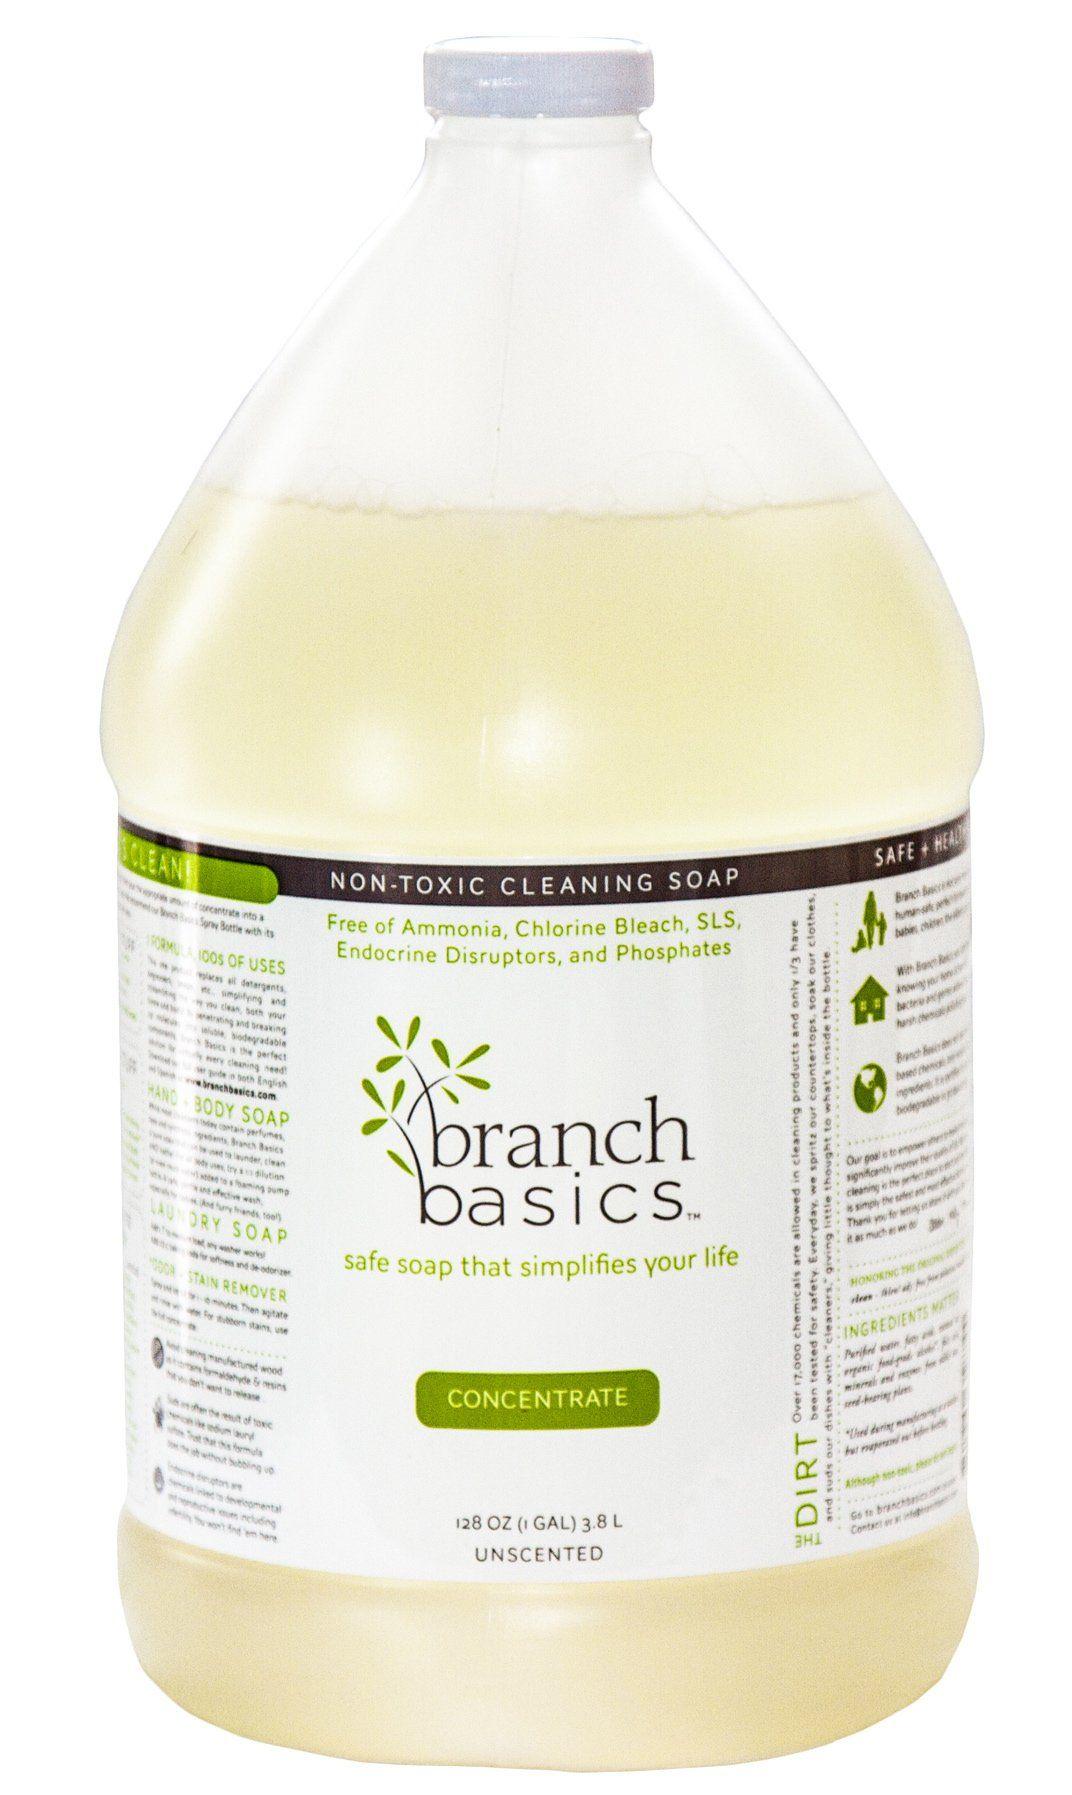 Branch basics soap 1 gallon concentrate 128